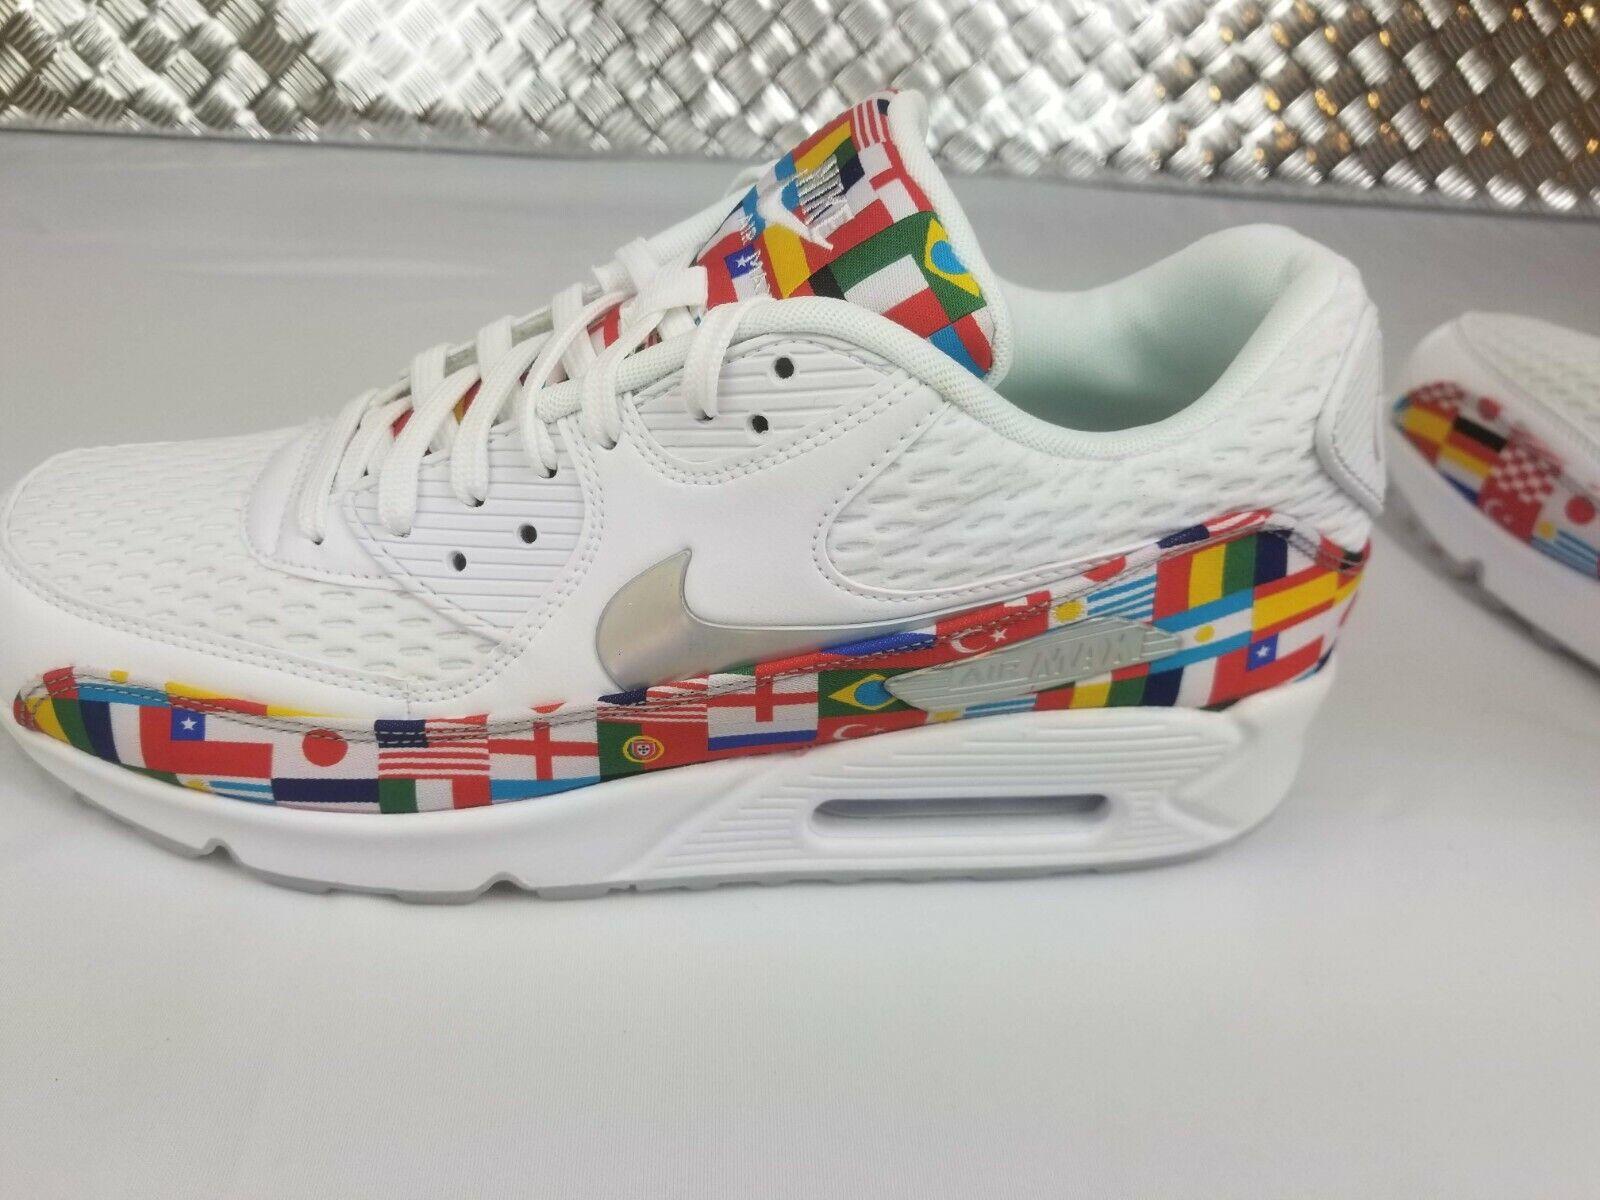 NEW Nike Air Max 90 NIC QS International Flag shoes White Mens Sz 8.5 AO5119-100